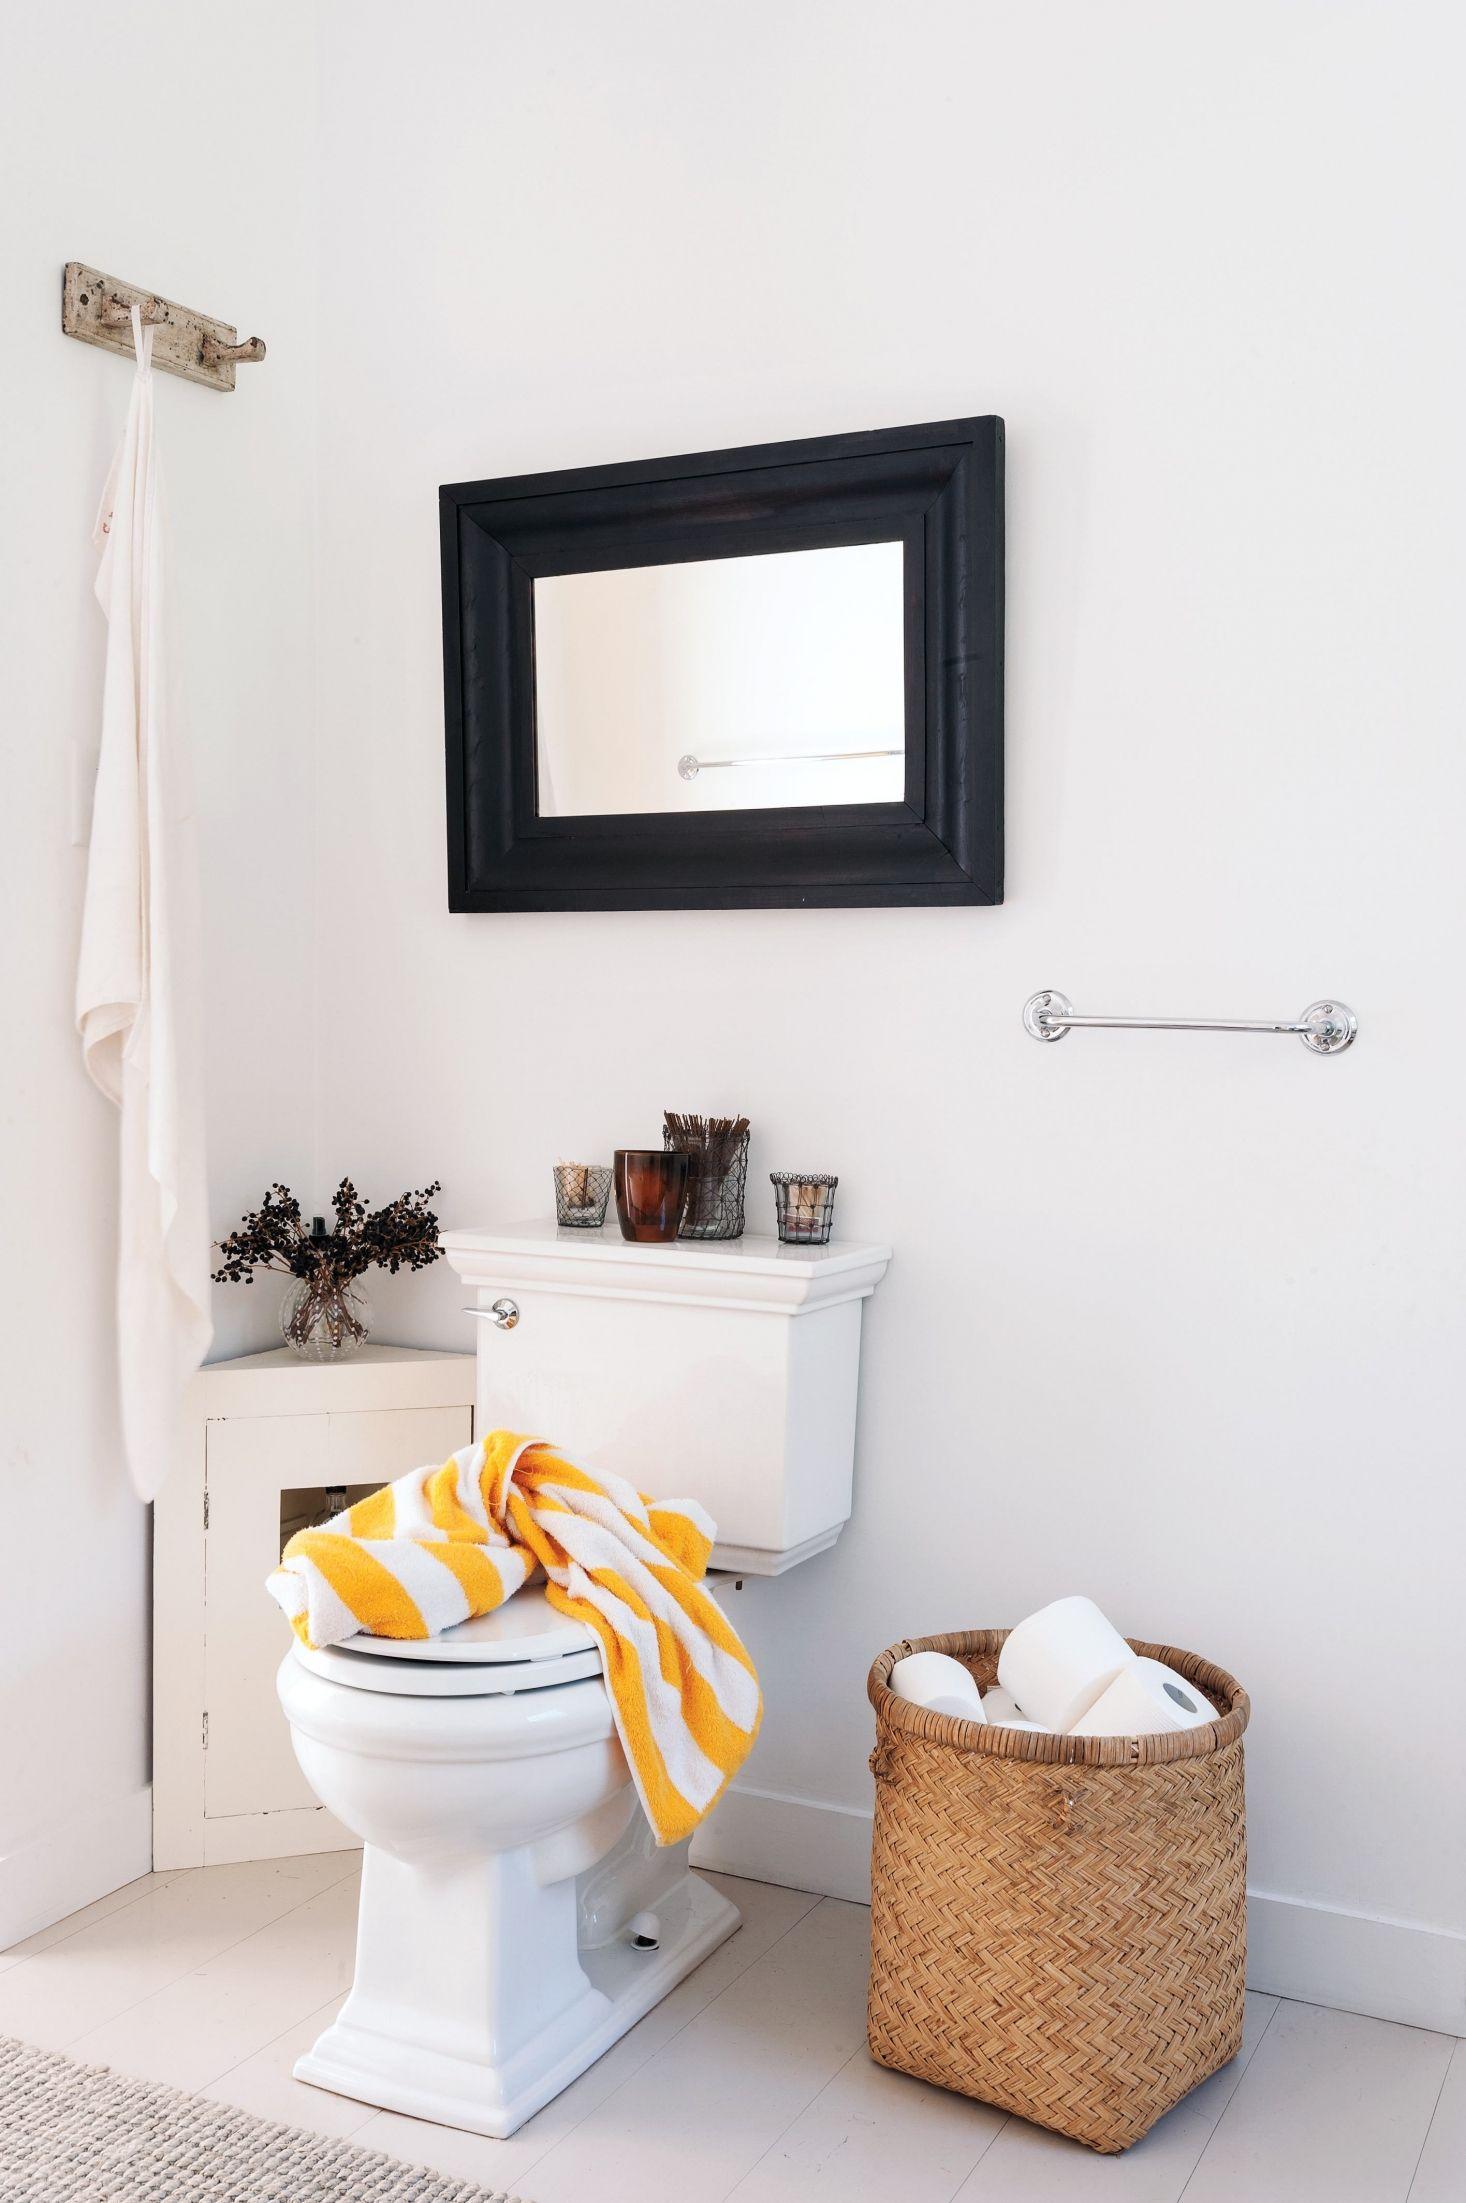 5 Quick Fixes Inventive Toilet Paper Storage Remodelista Diy Toilet Paper Holder Toilet Paper Storage Toilet Paper Holder